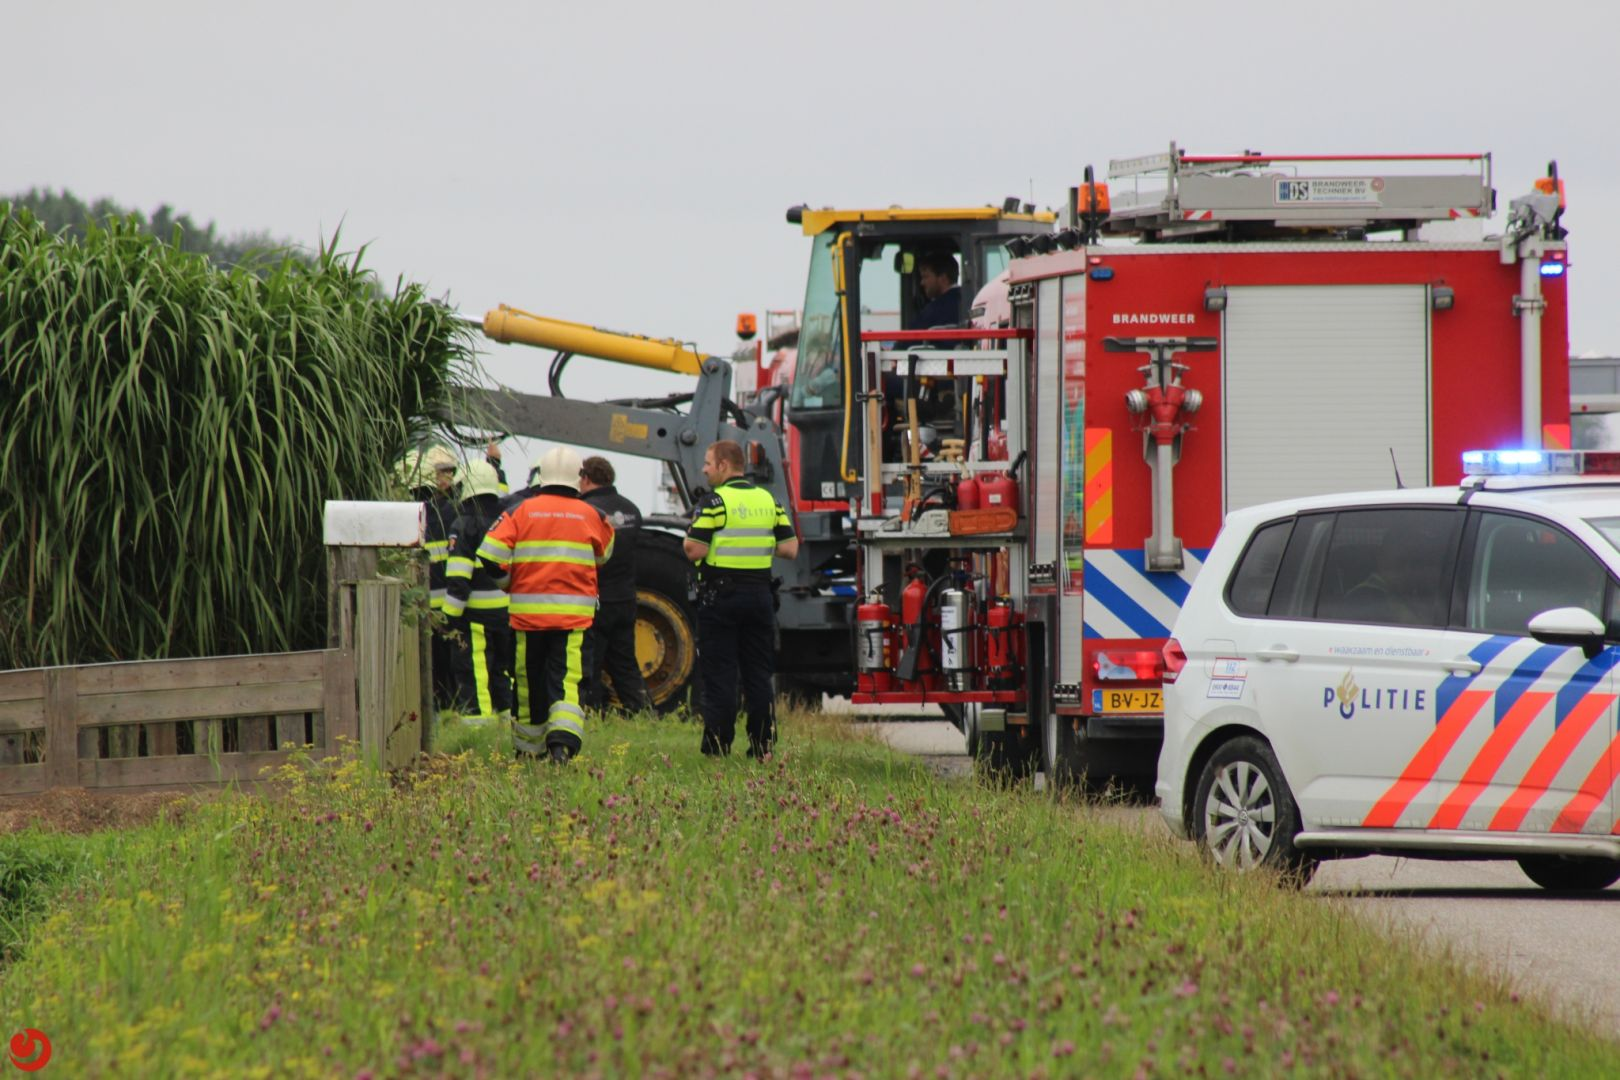 Persoon bekneld onder tractor